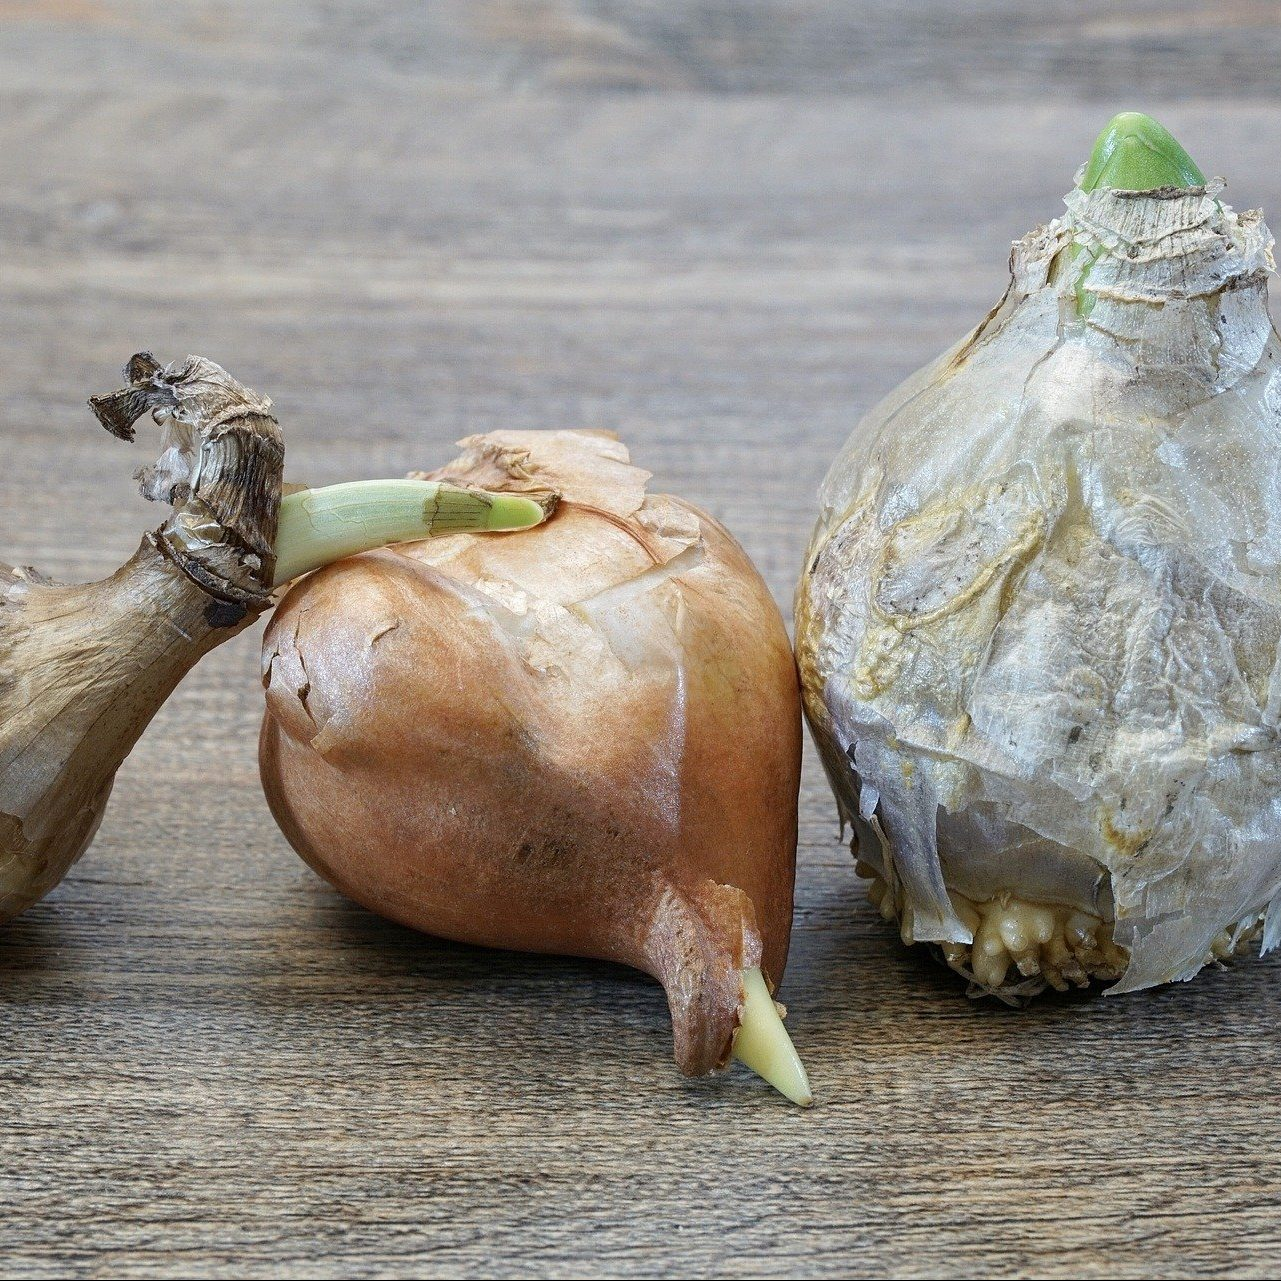 Zwiebelpflanze - Angebot -2